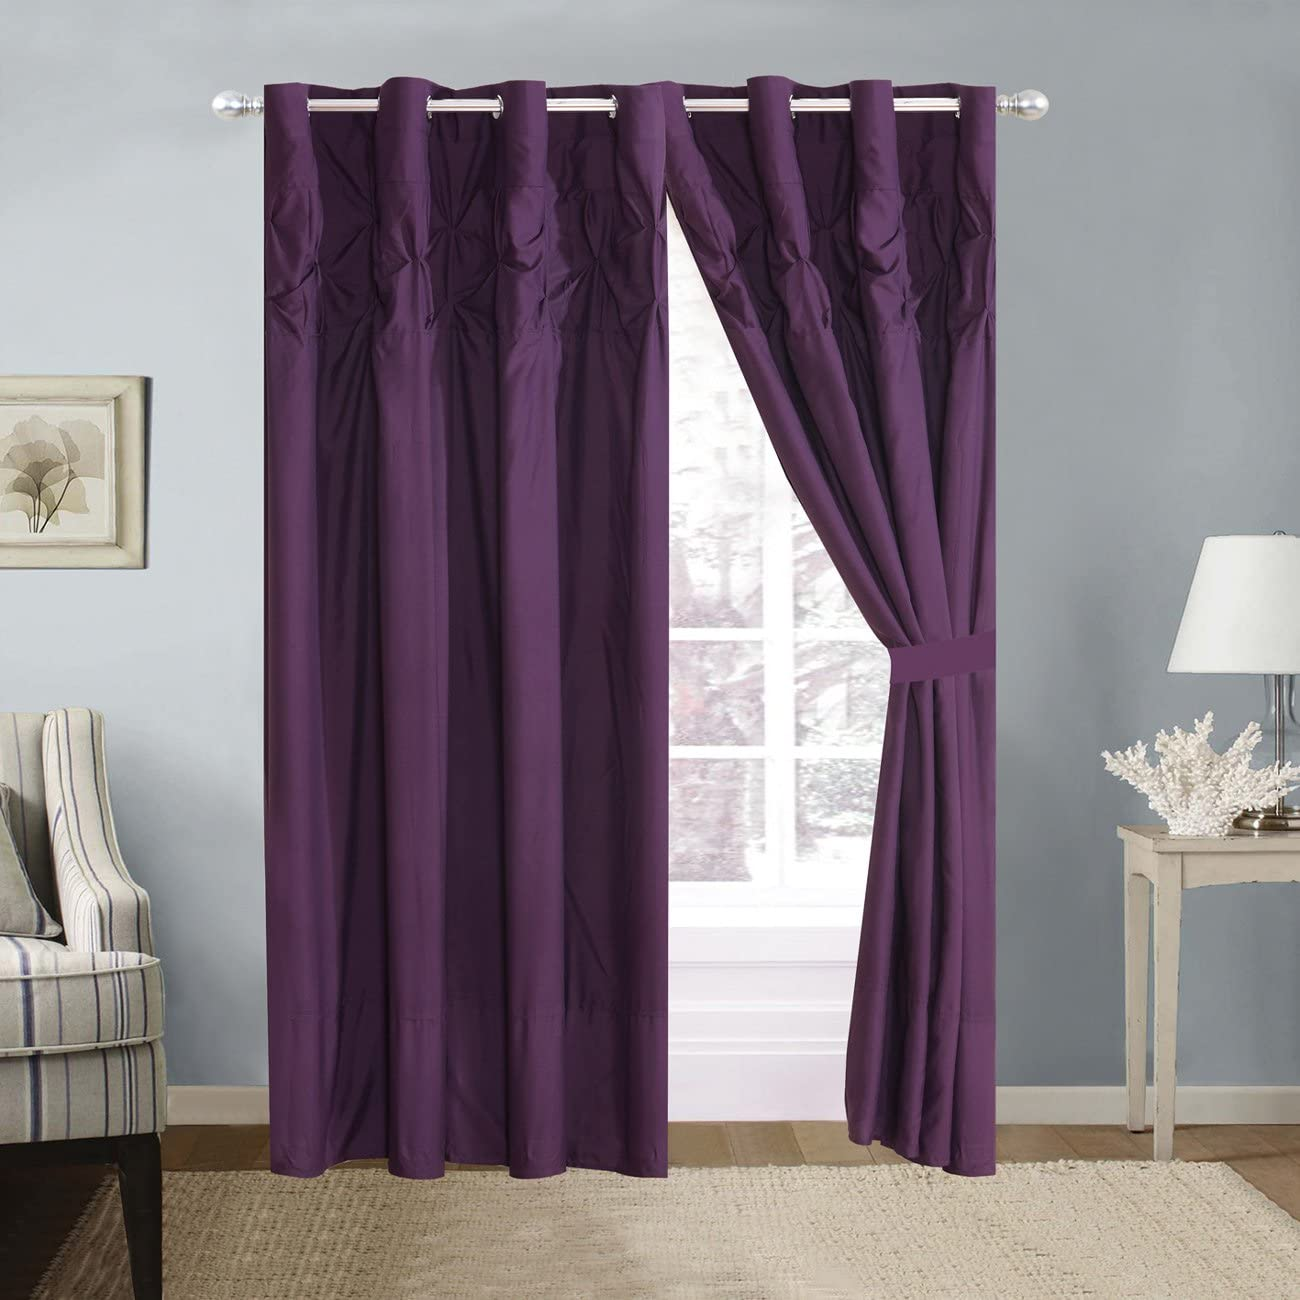 4 Piece Solid Dark Purple Double-Needle Stitch Pinch Pleat Grommet Window Curtain Set 108 x 84-inch, 2 Panels and 2 Ties